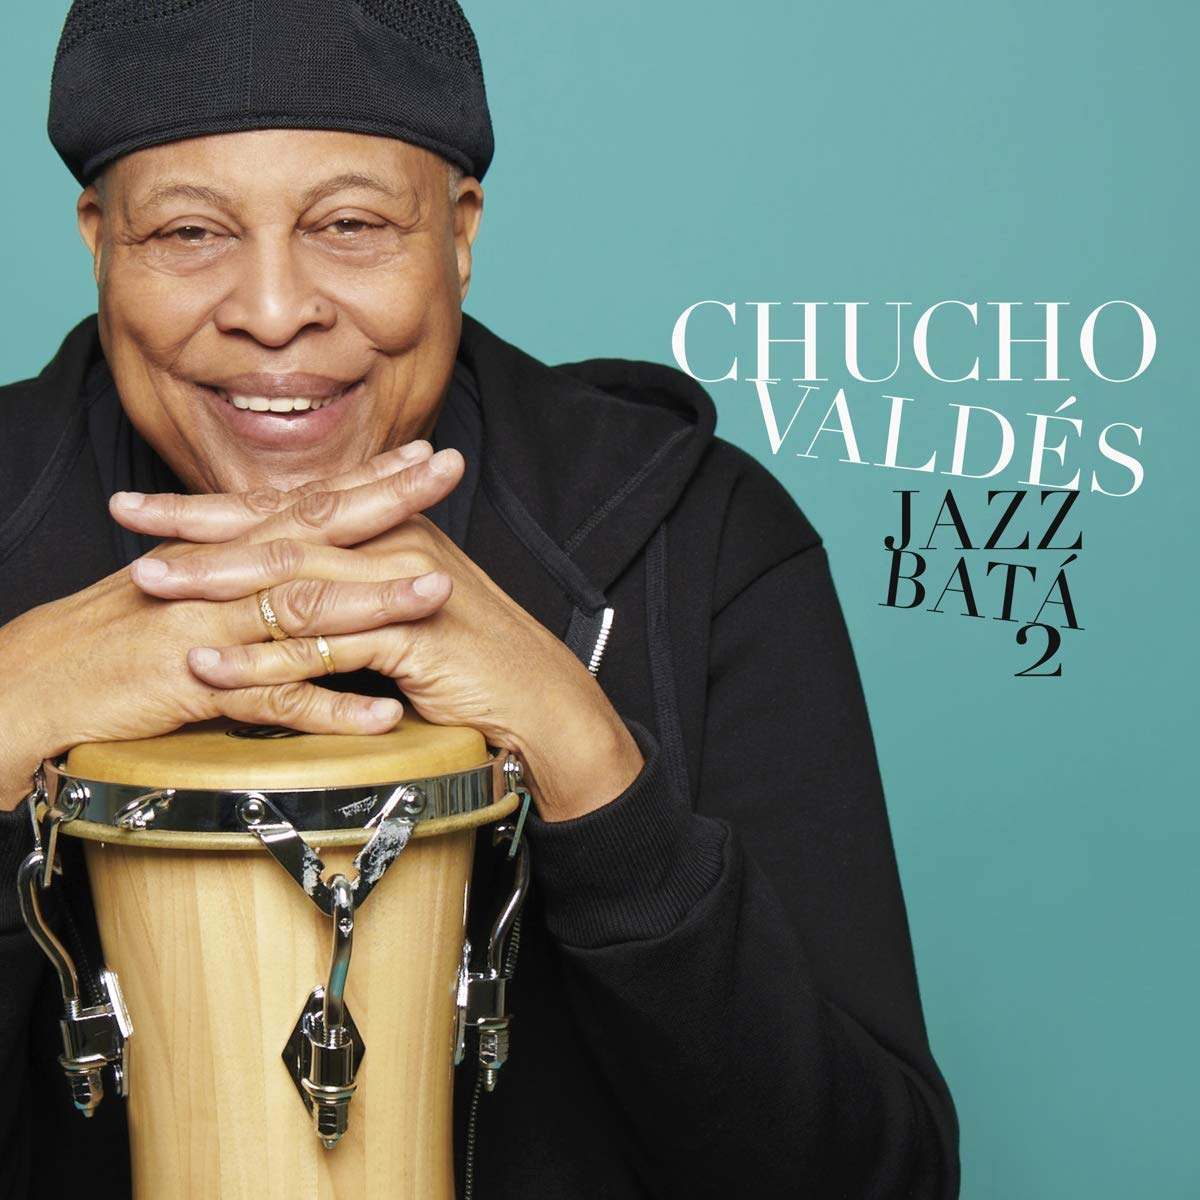 CD : Chucho Valdes - Jazz Bata 2 (CD)